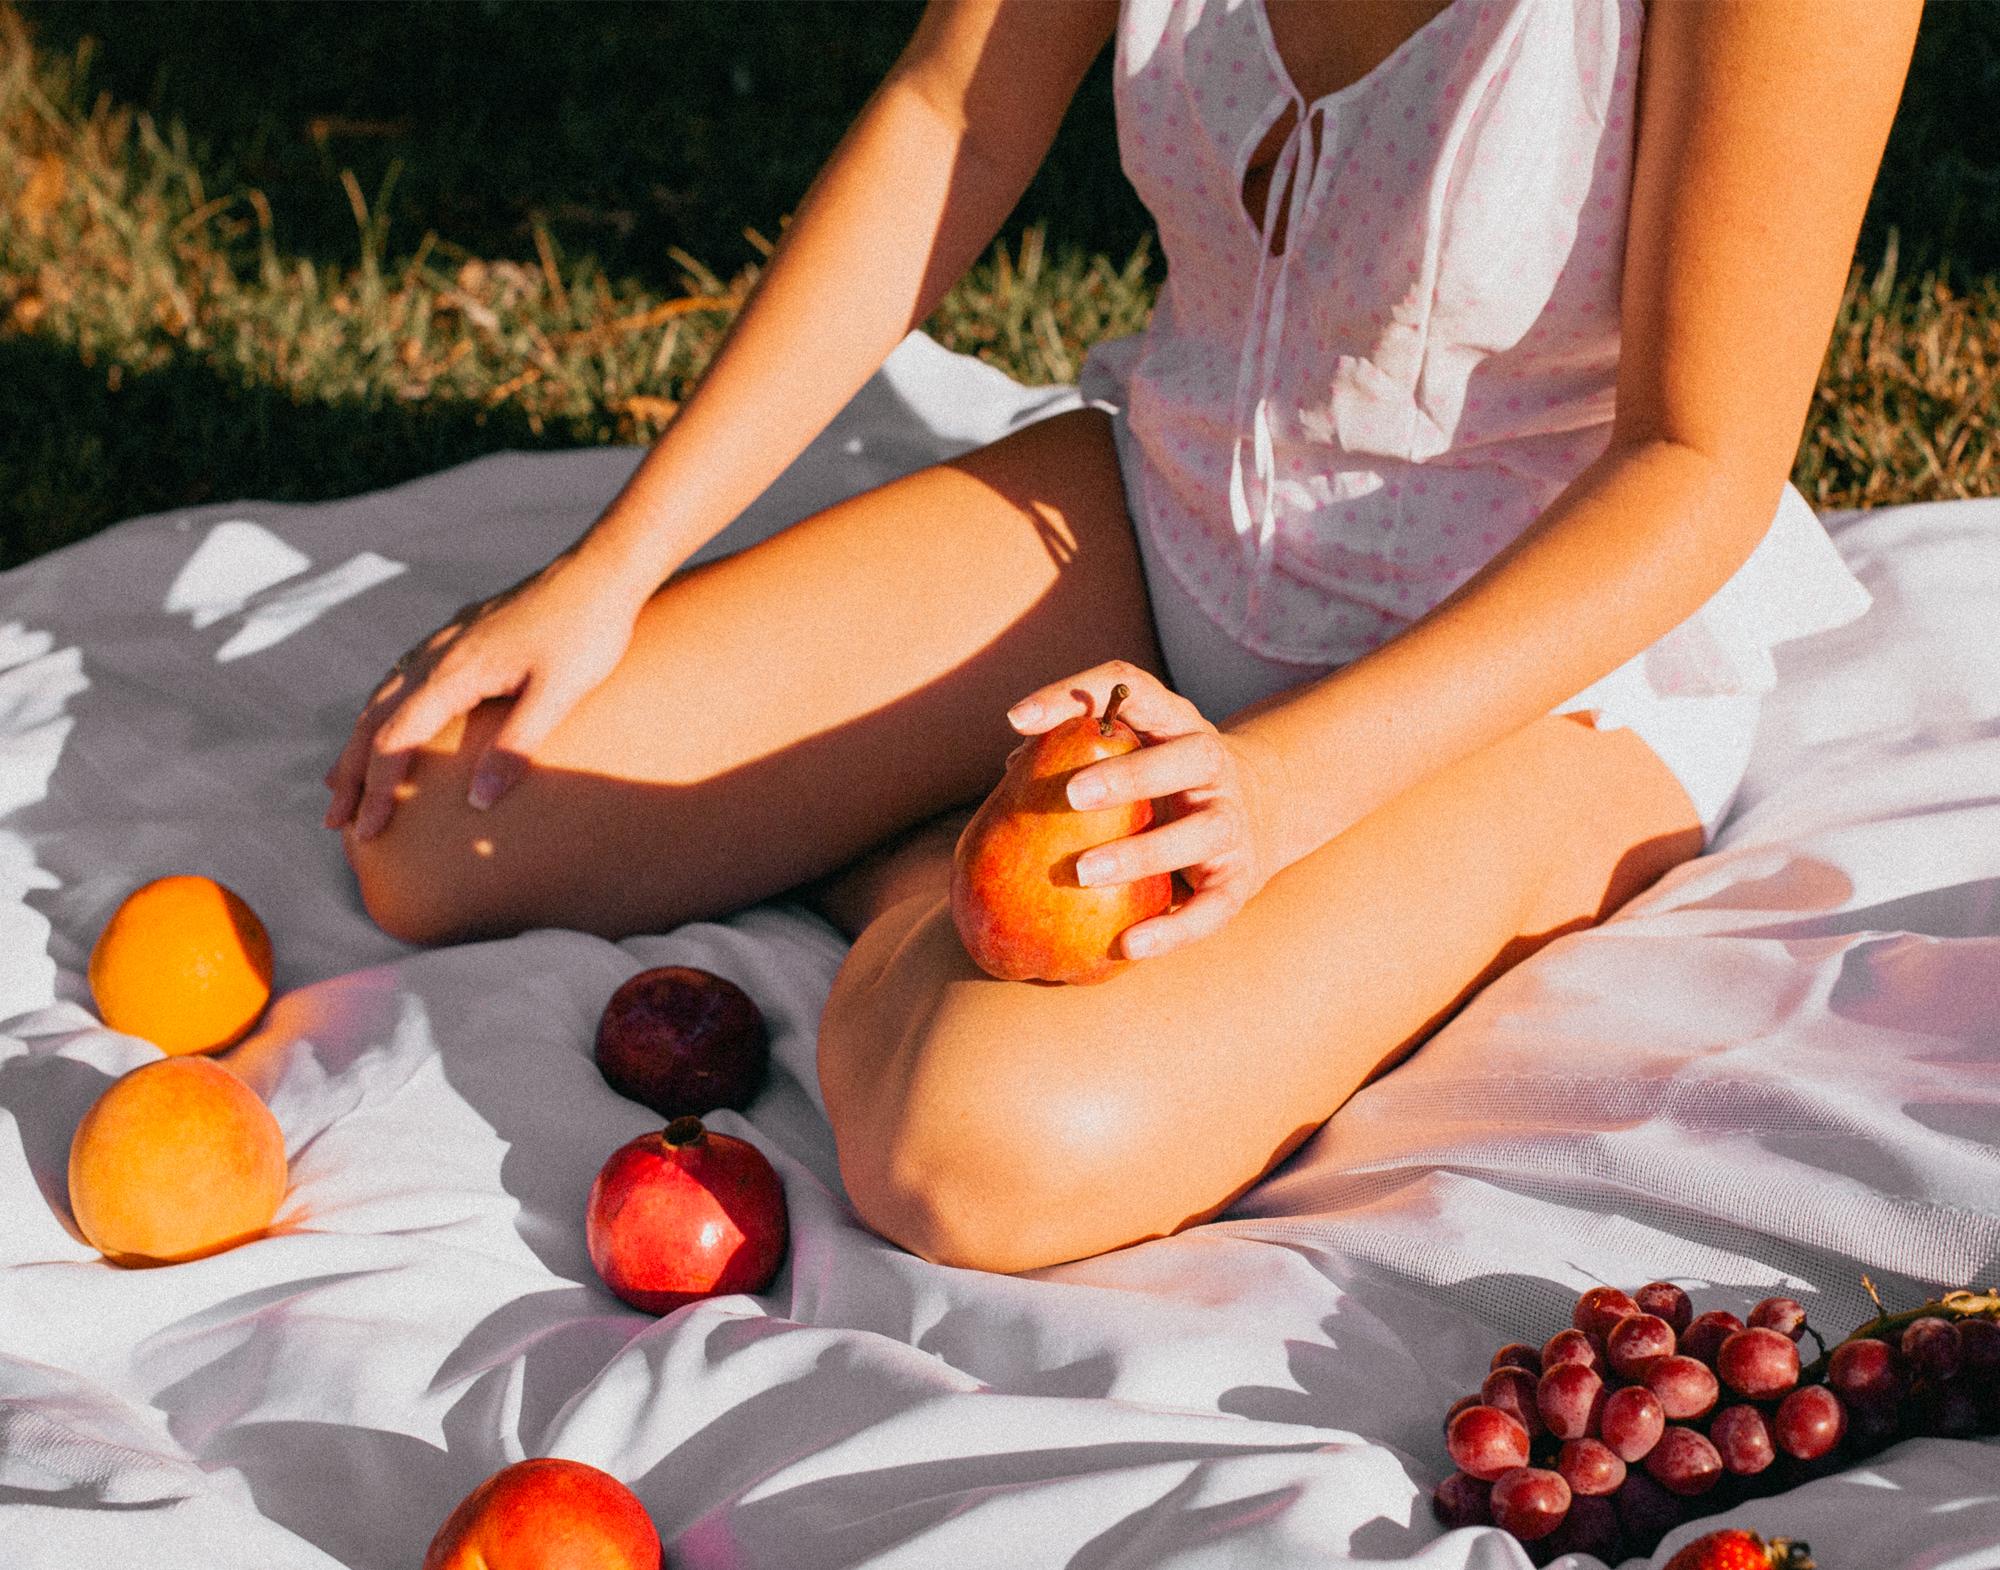 woman on white blanket holding fruit